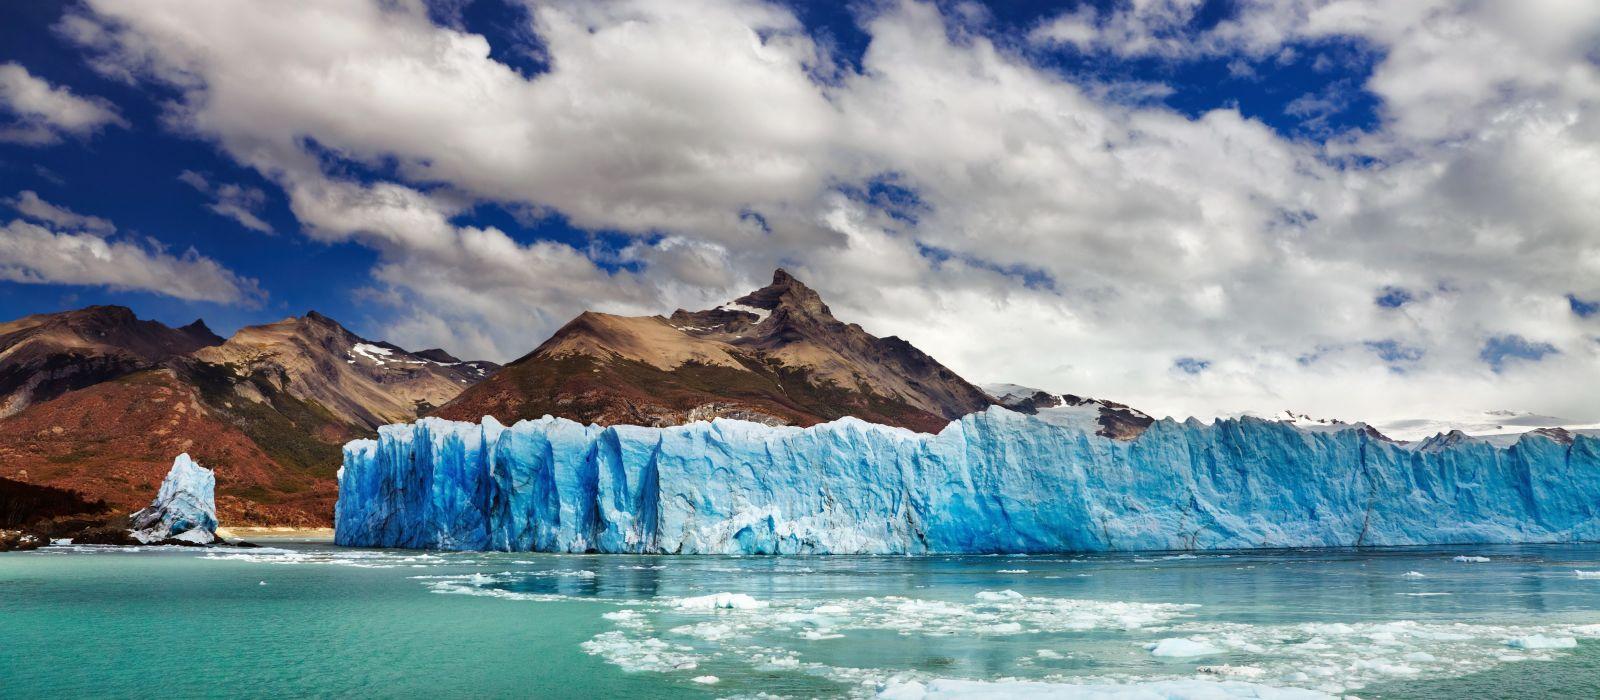 Argentina: South Patagonia Tour Trip 4